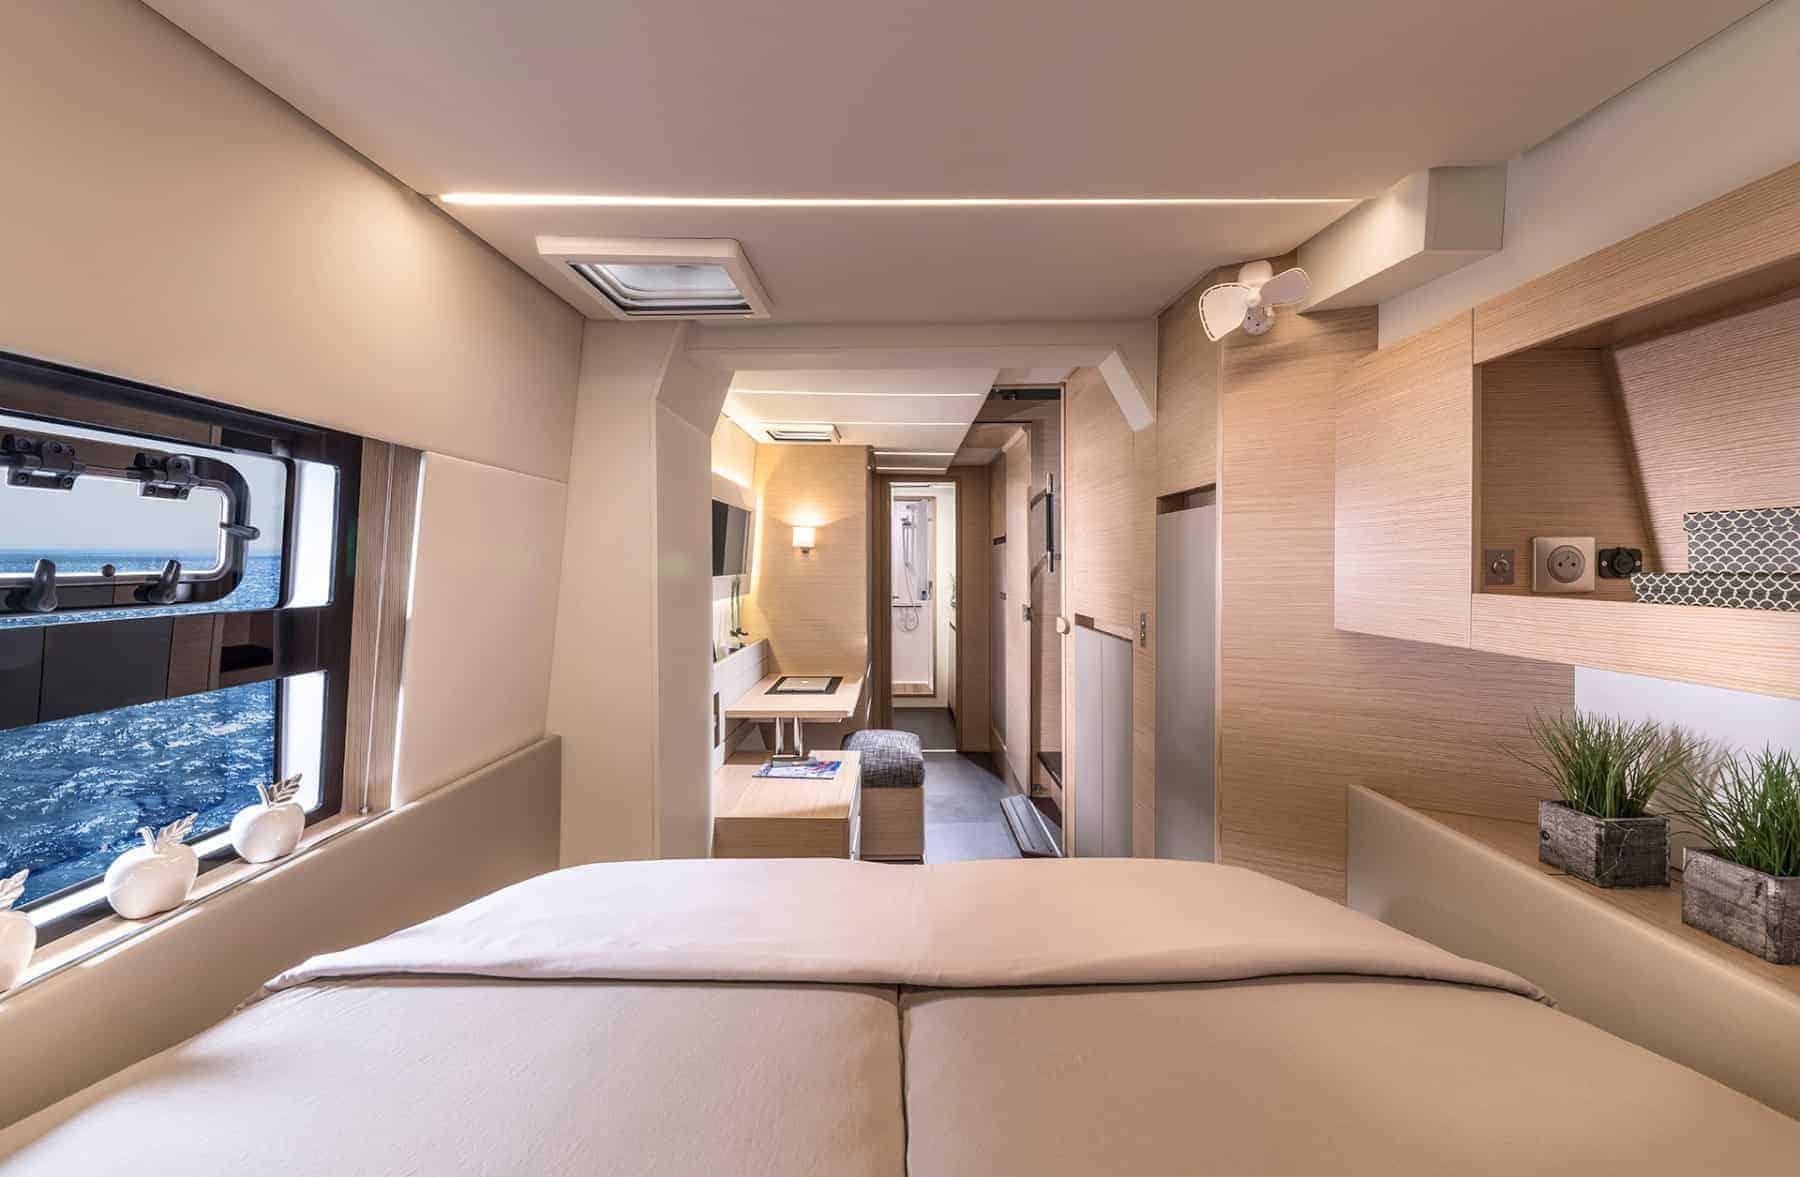 Bavaria-Nautitech-47-power-interior-cabin-2-charter-ownership-yacht